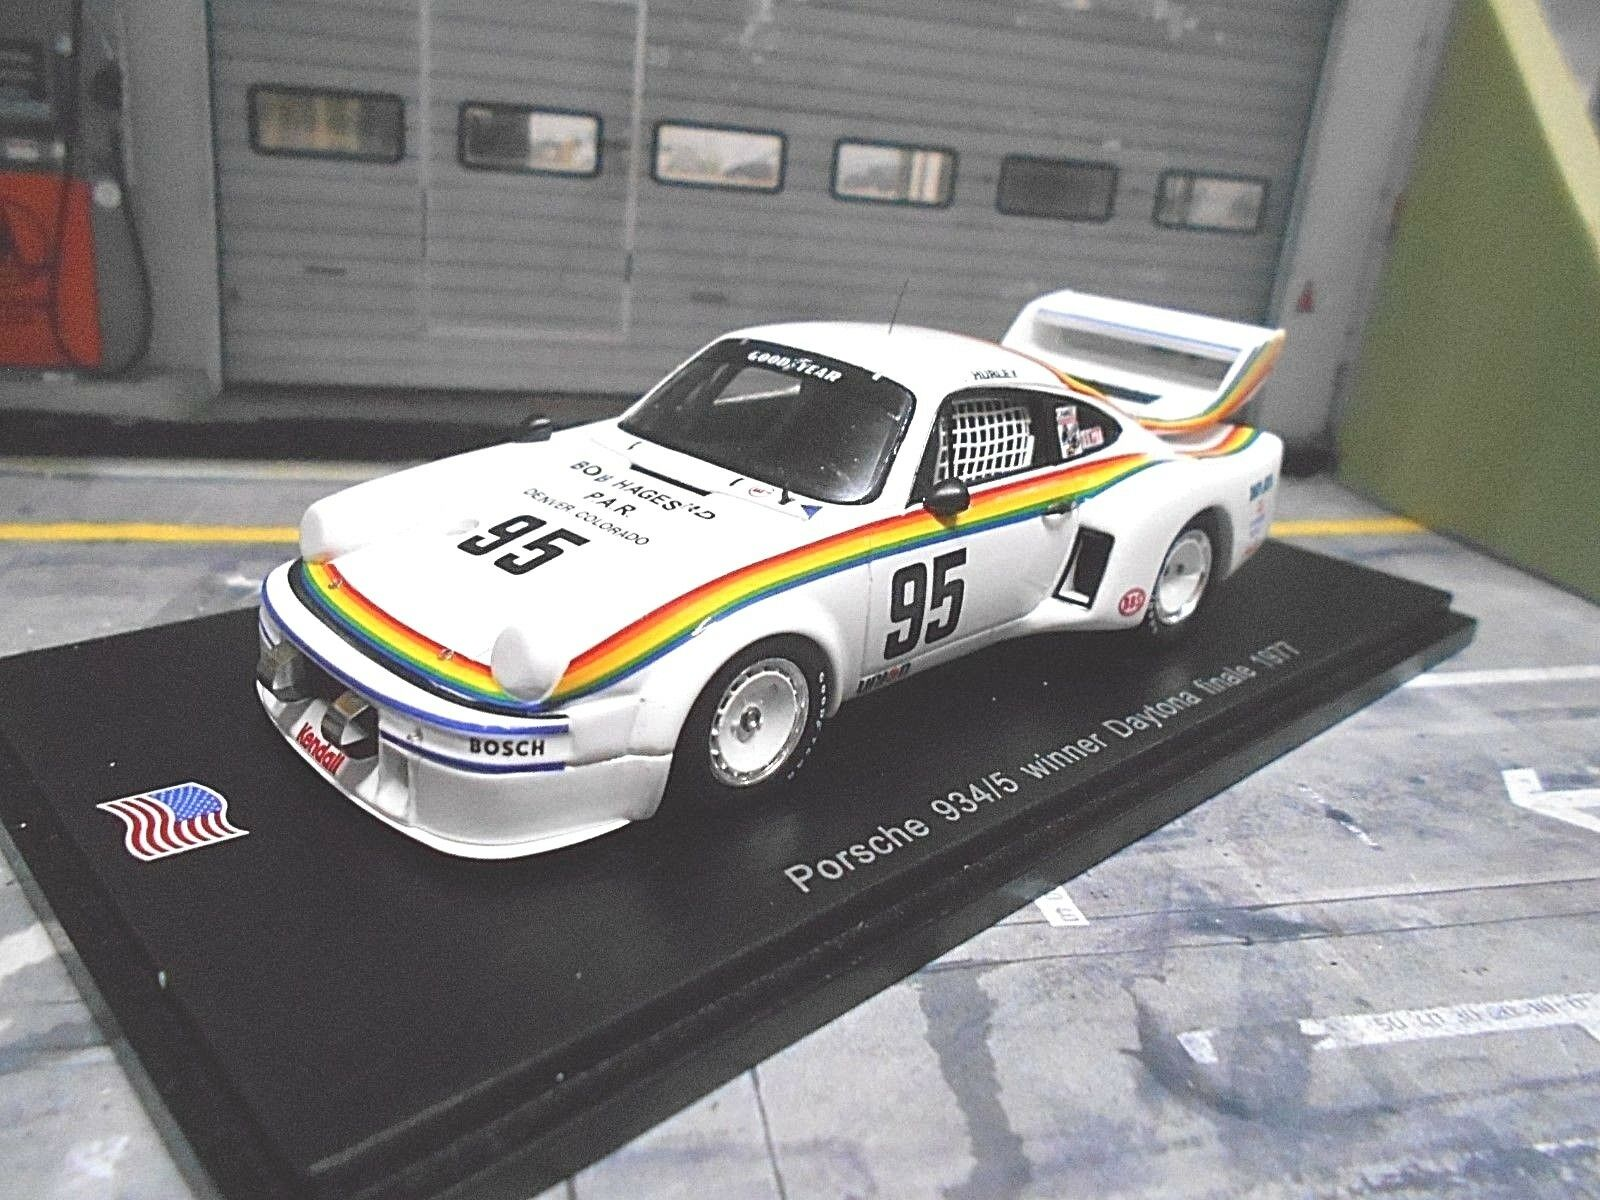 PORSCHE 934 5 934 5 Daytona Winner 1977  95 Haywood hagestad New Spark 1 43